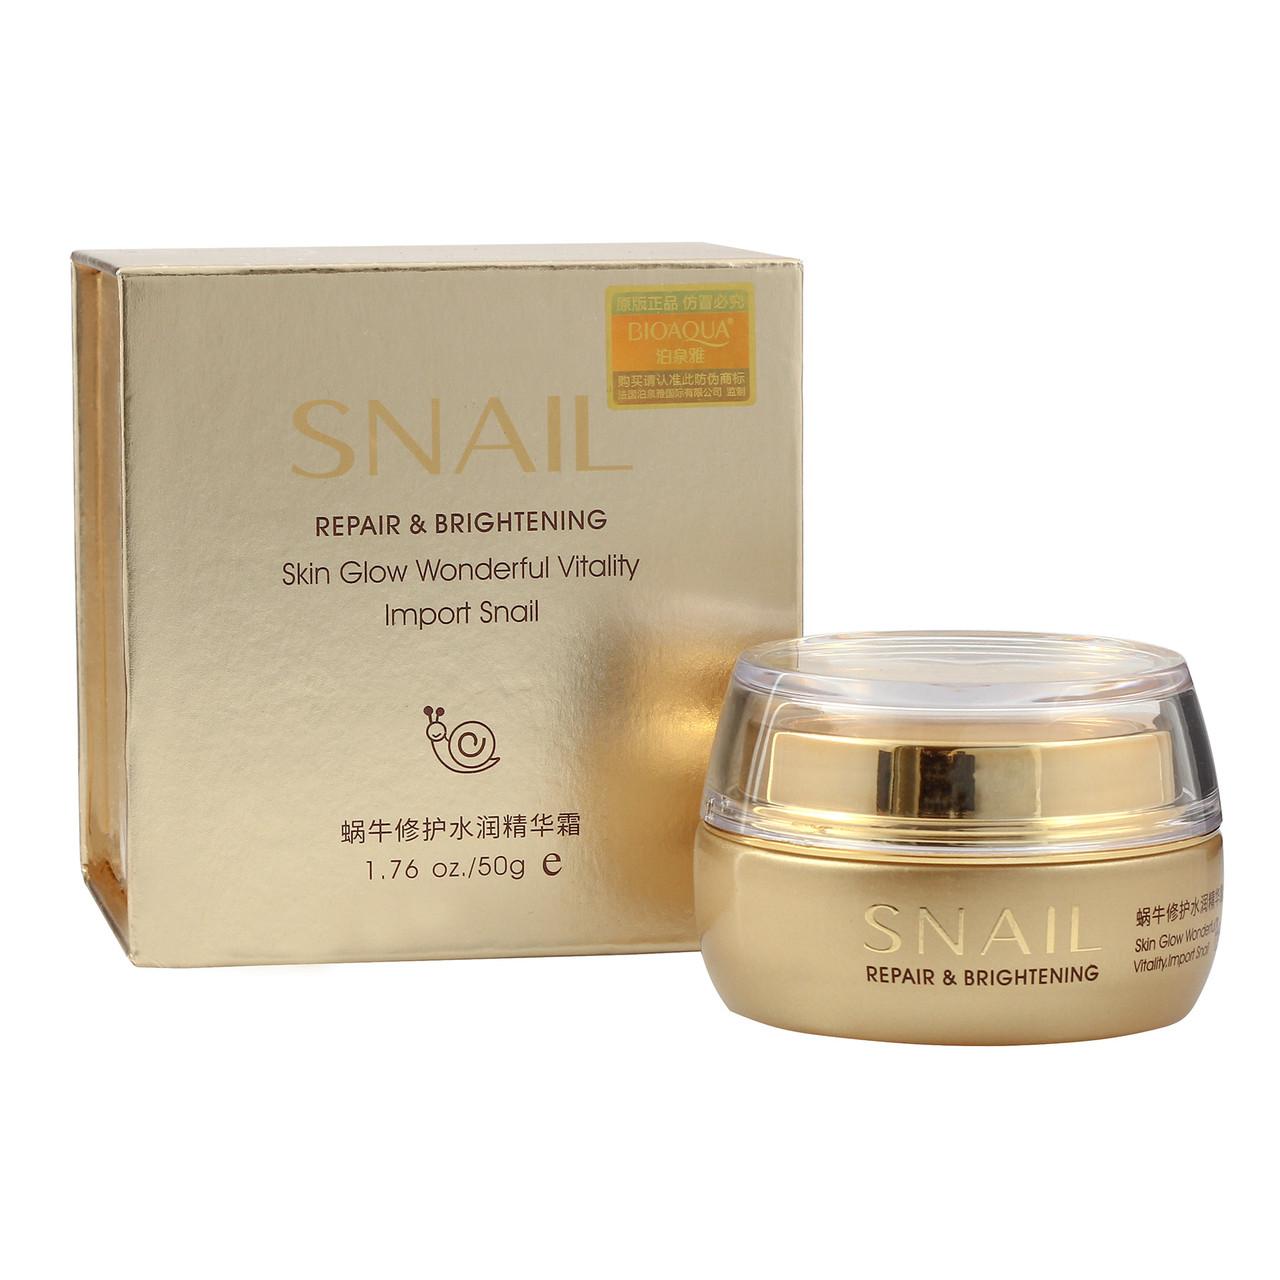 Крем для лица с муцином улитки BioАqua Snail Repair & Brightening Cream, 50 г